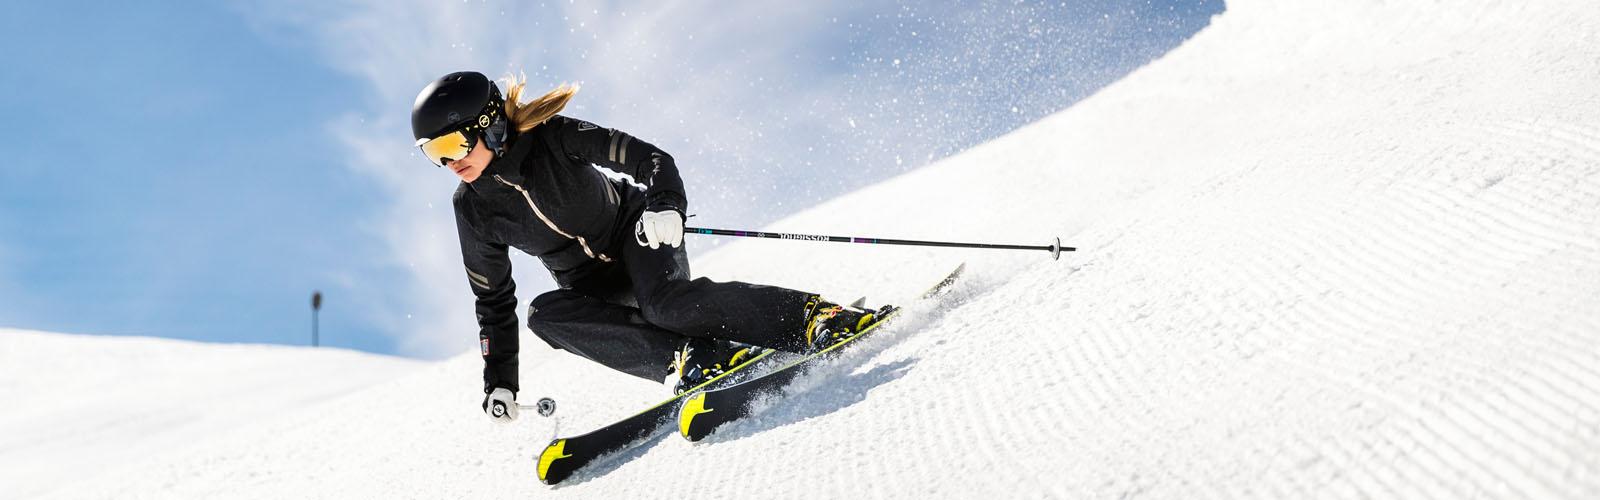 Sport Milanovic - beste Ski Auswahl